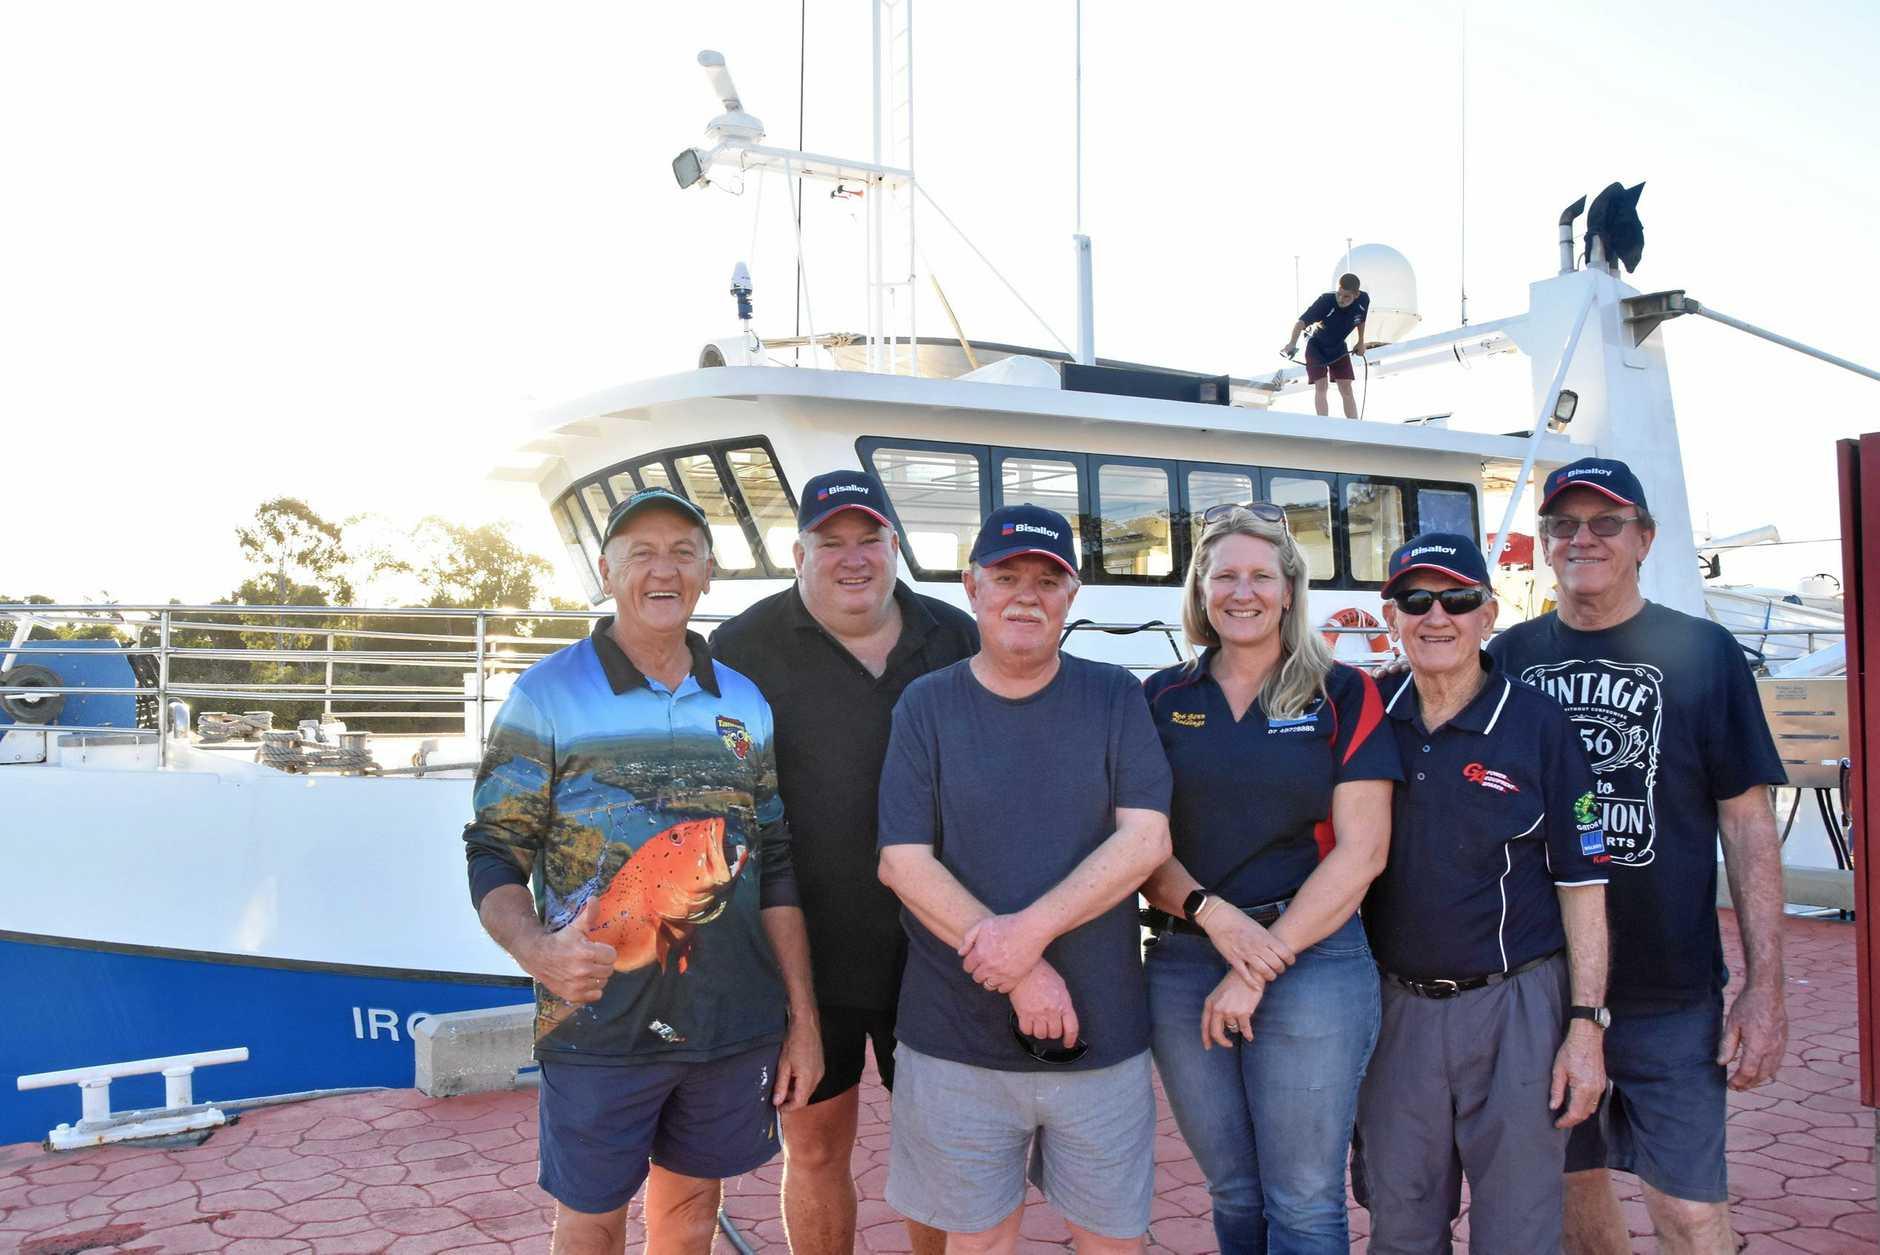 READY TO GO: Glenn Churchill, Brian Mepham, Kim Pascoe, Anita Benn, Russ Pedwell and Bruce Whitfield ready to board the Iron Joy in Gladstone on Friday.